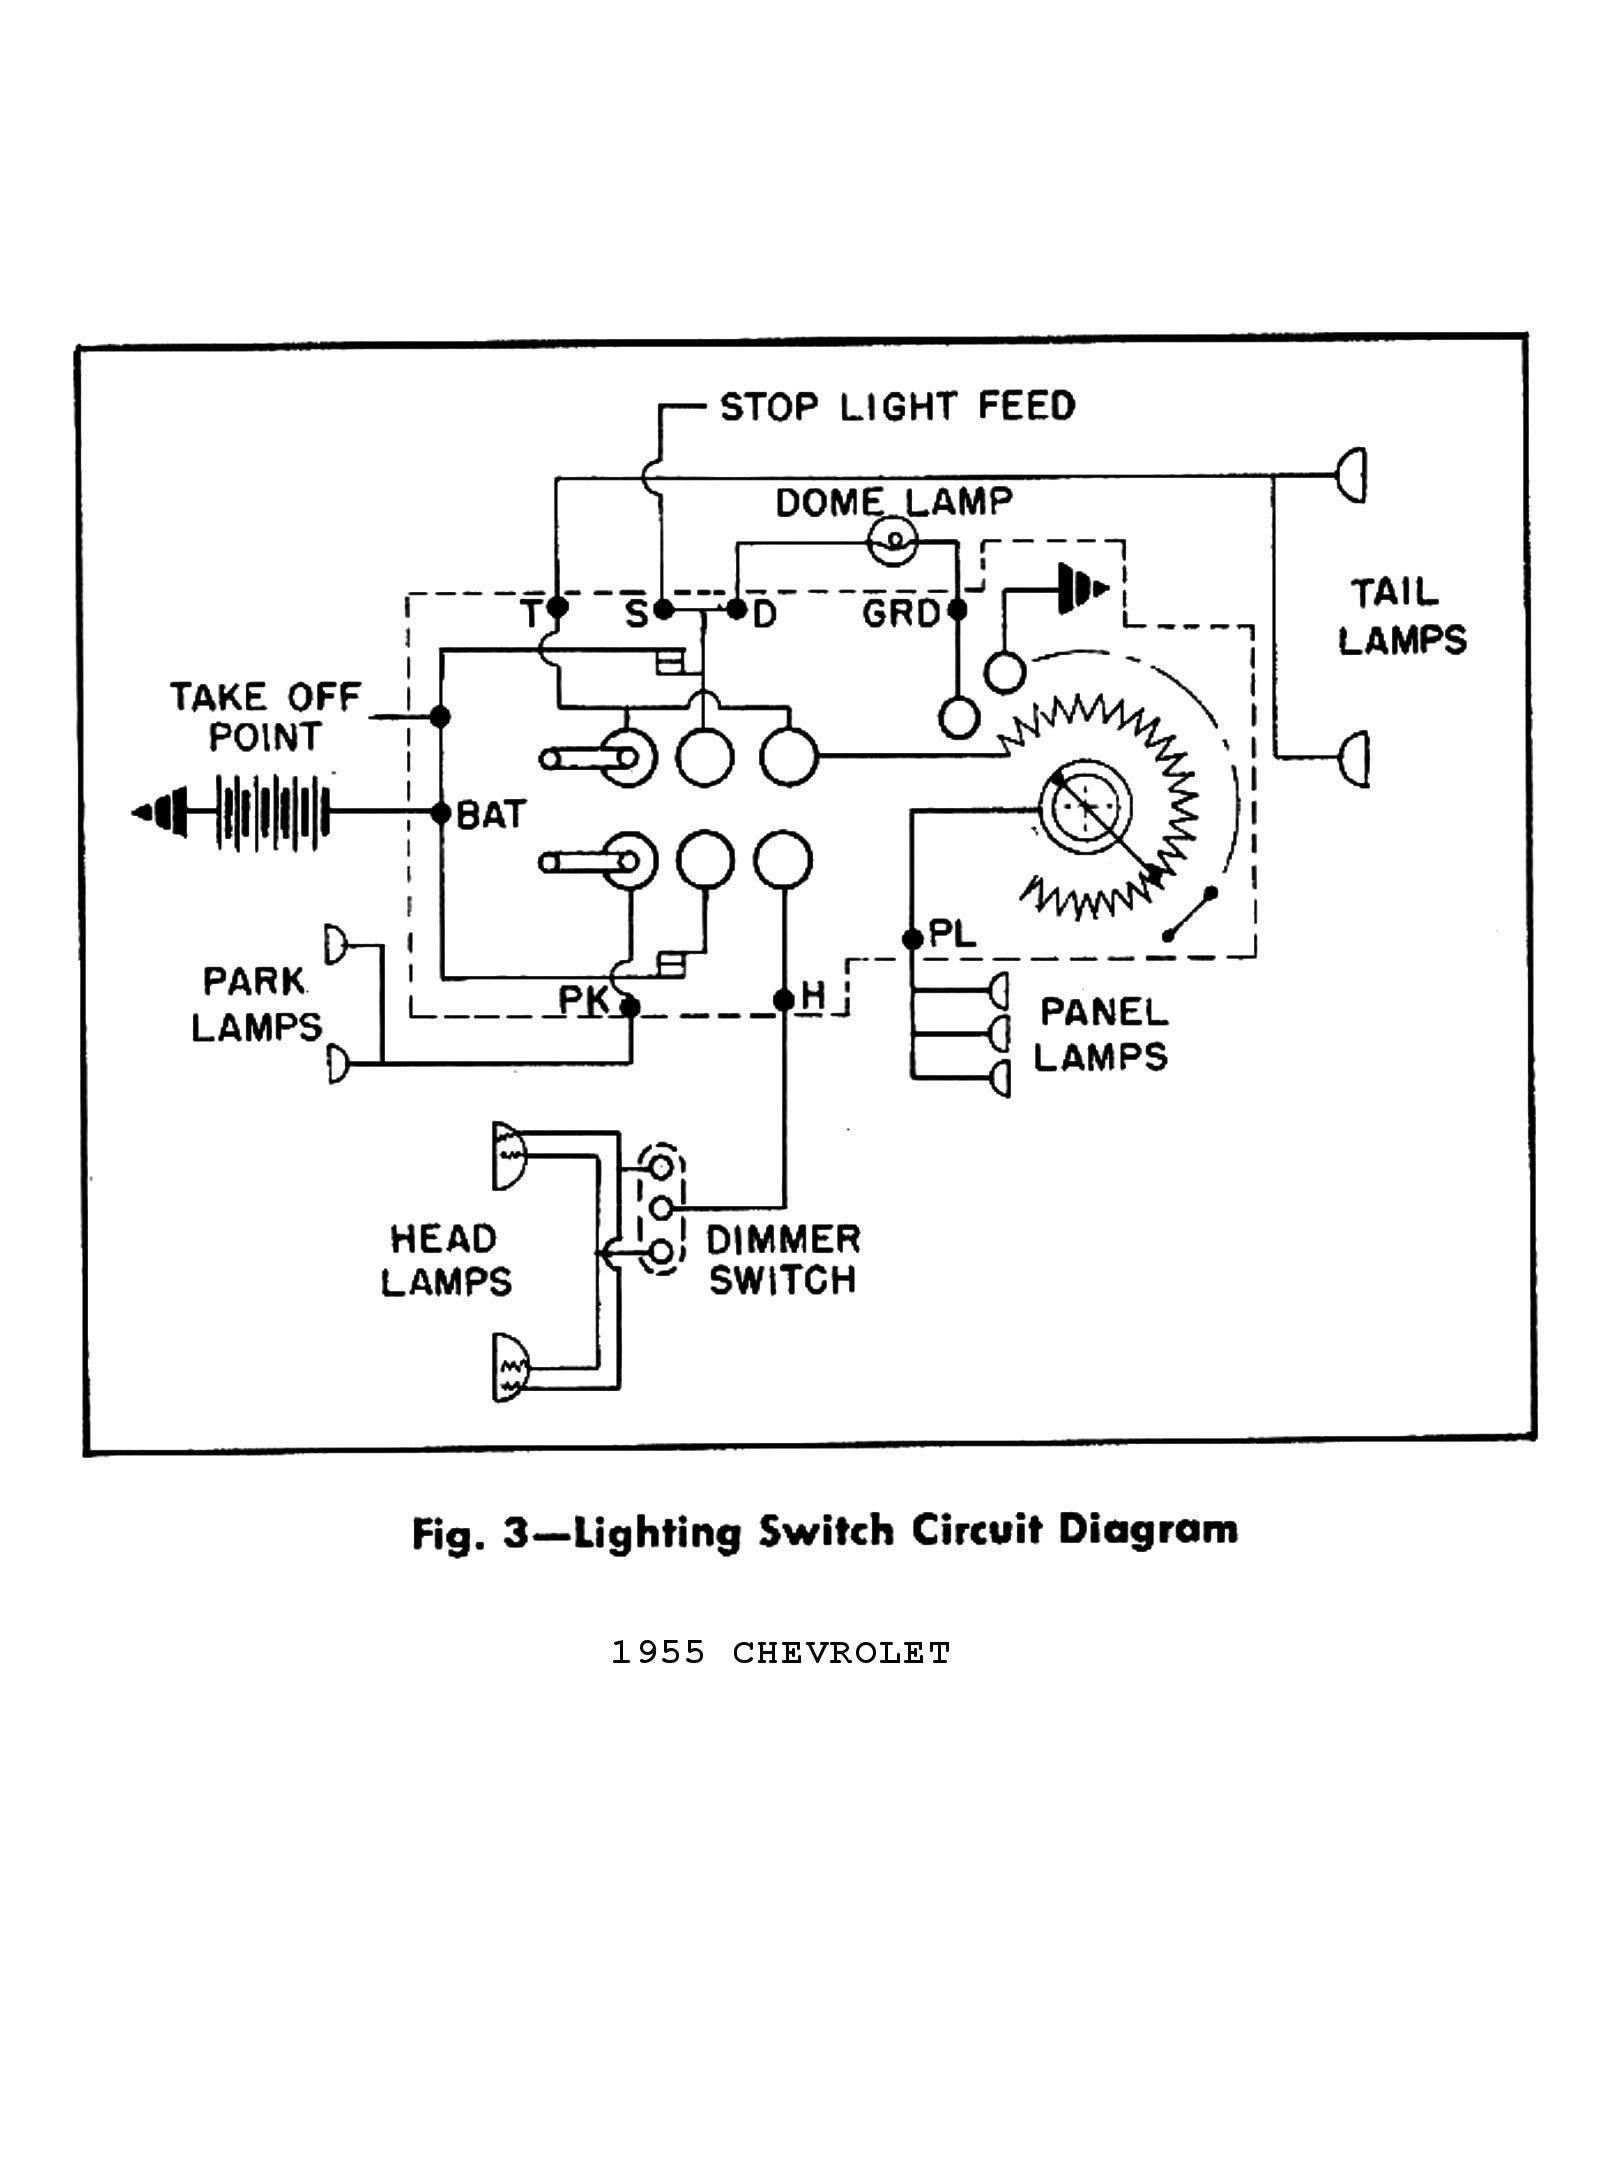 1947 Chevy Headlight Switch Wiring Diagram | Manual E-Books - Chevy Headlight Switch Wiring Diagram